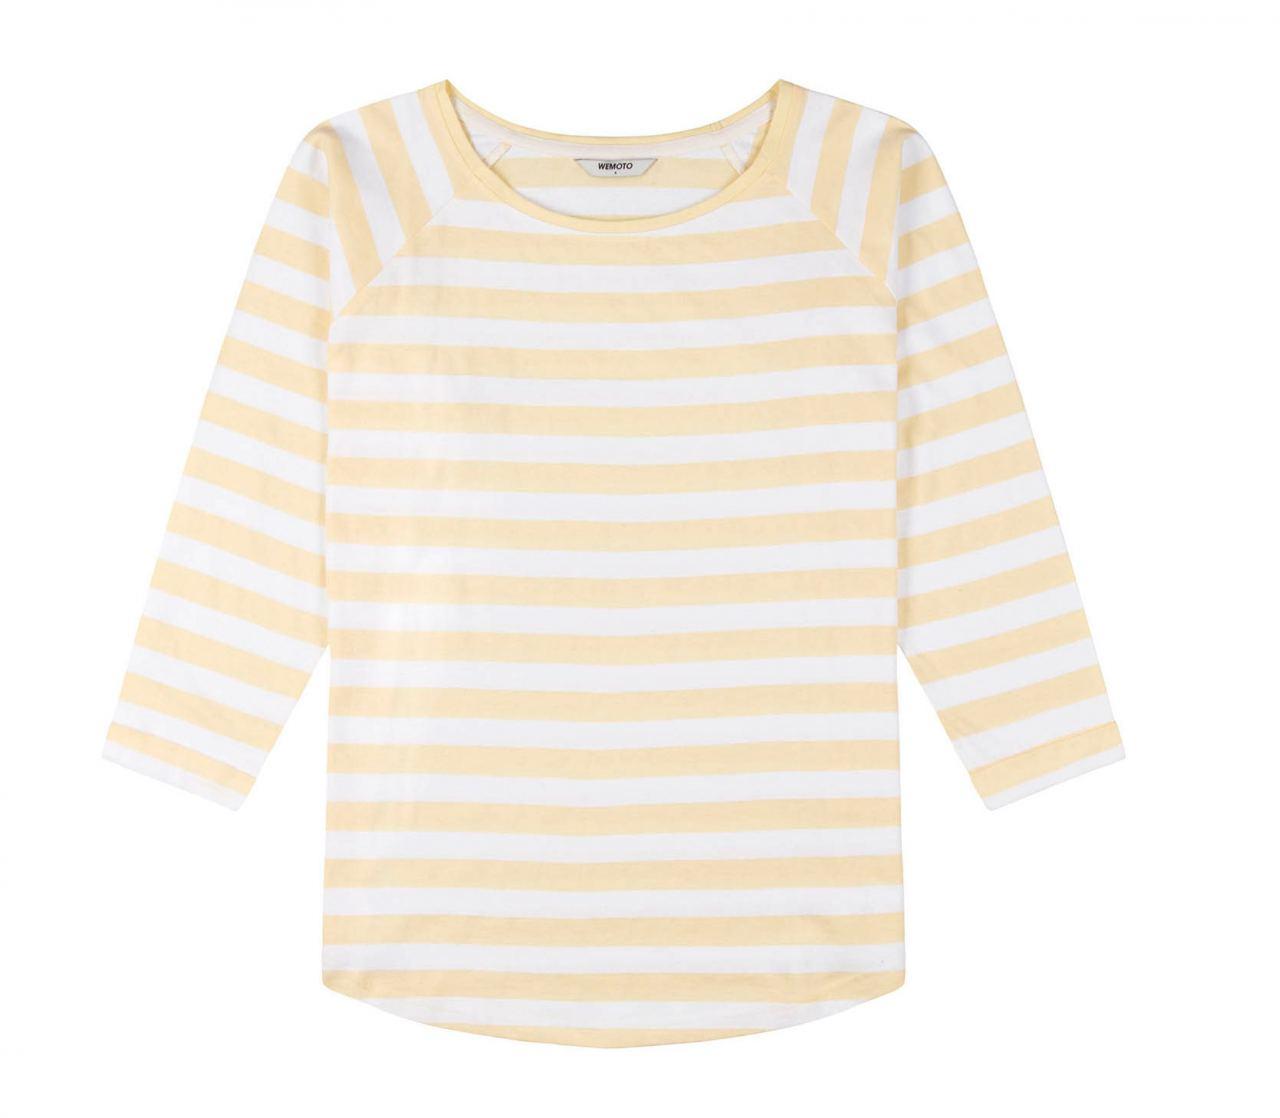 Shane Striped Shirt Tender Yellow White